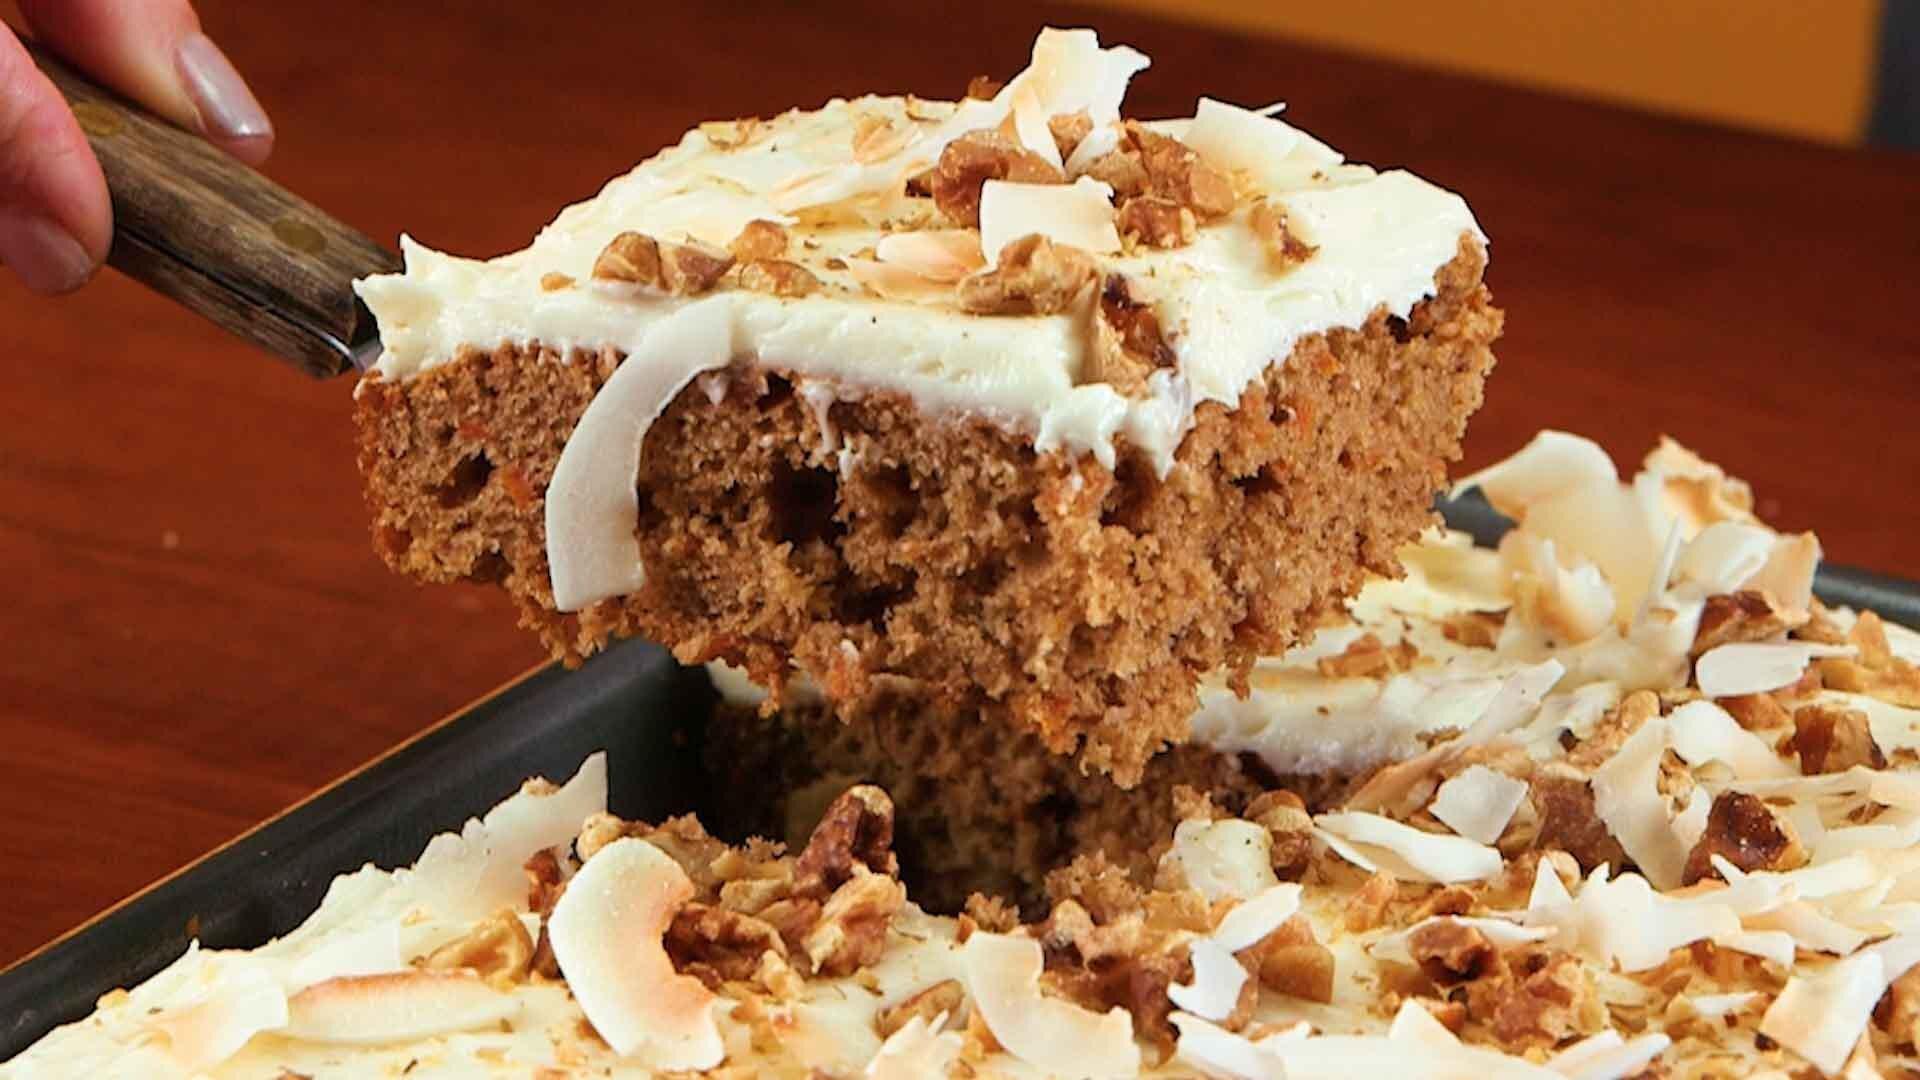 How to Make Shortcut Carrot Sheet Cake